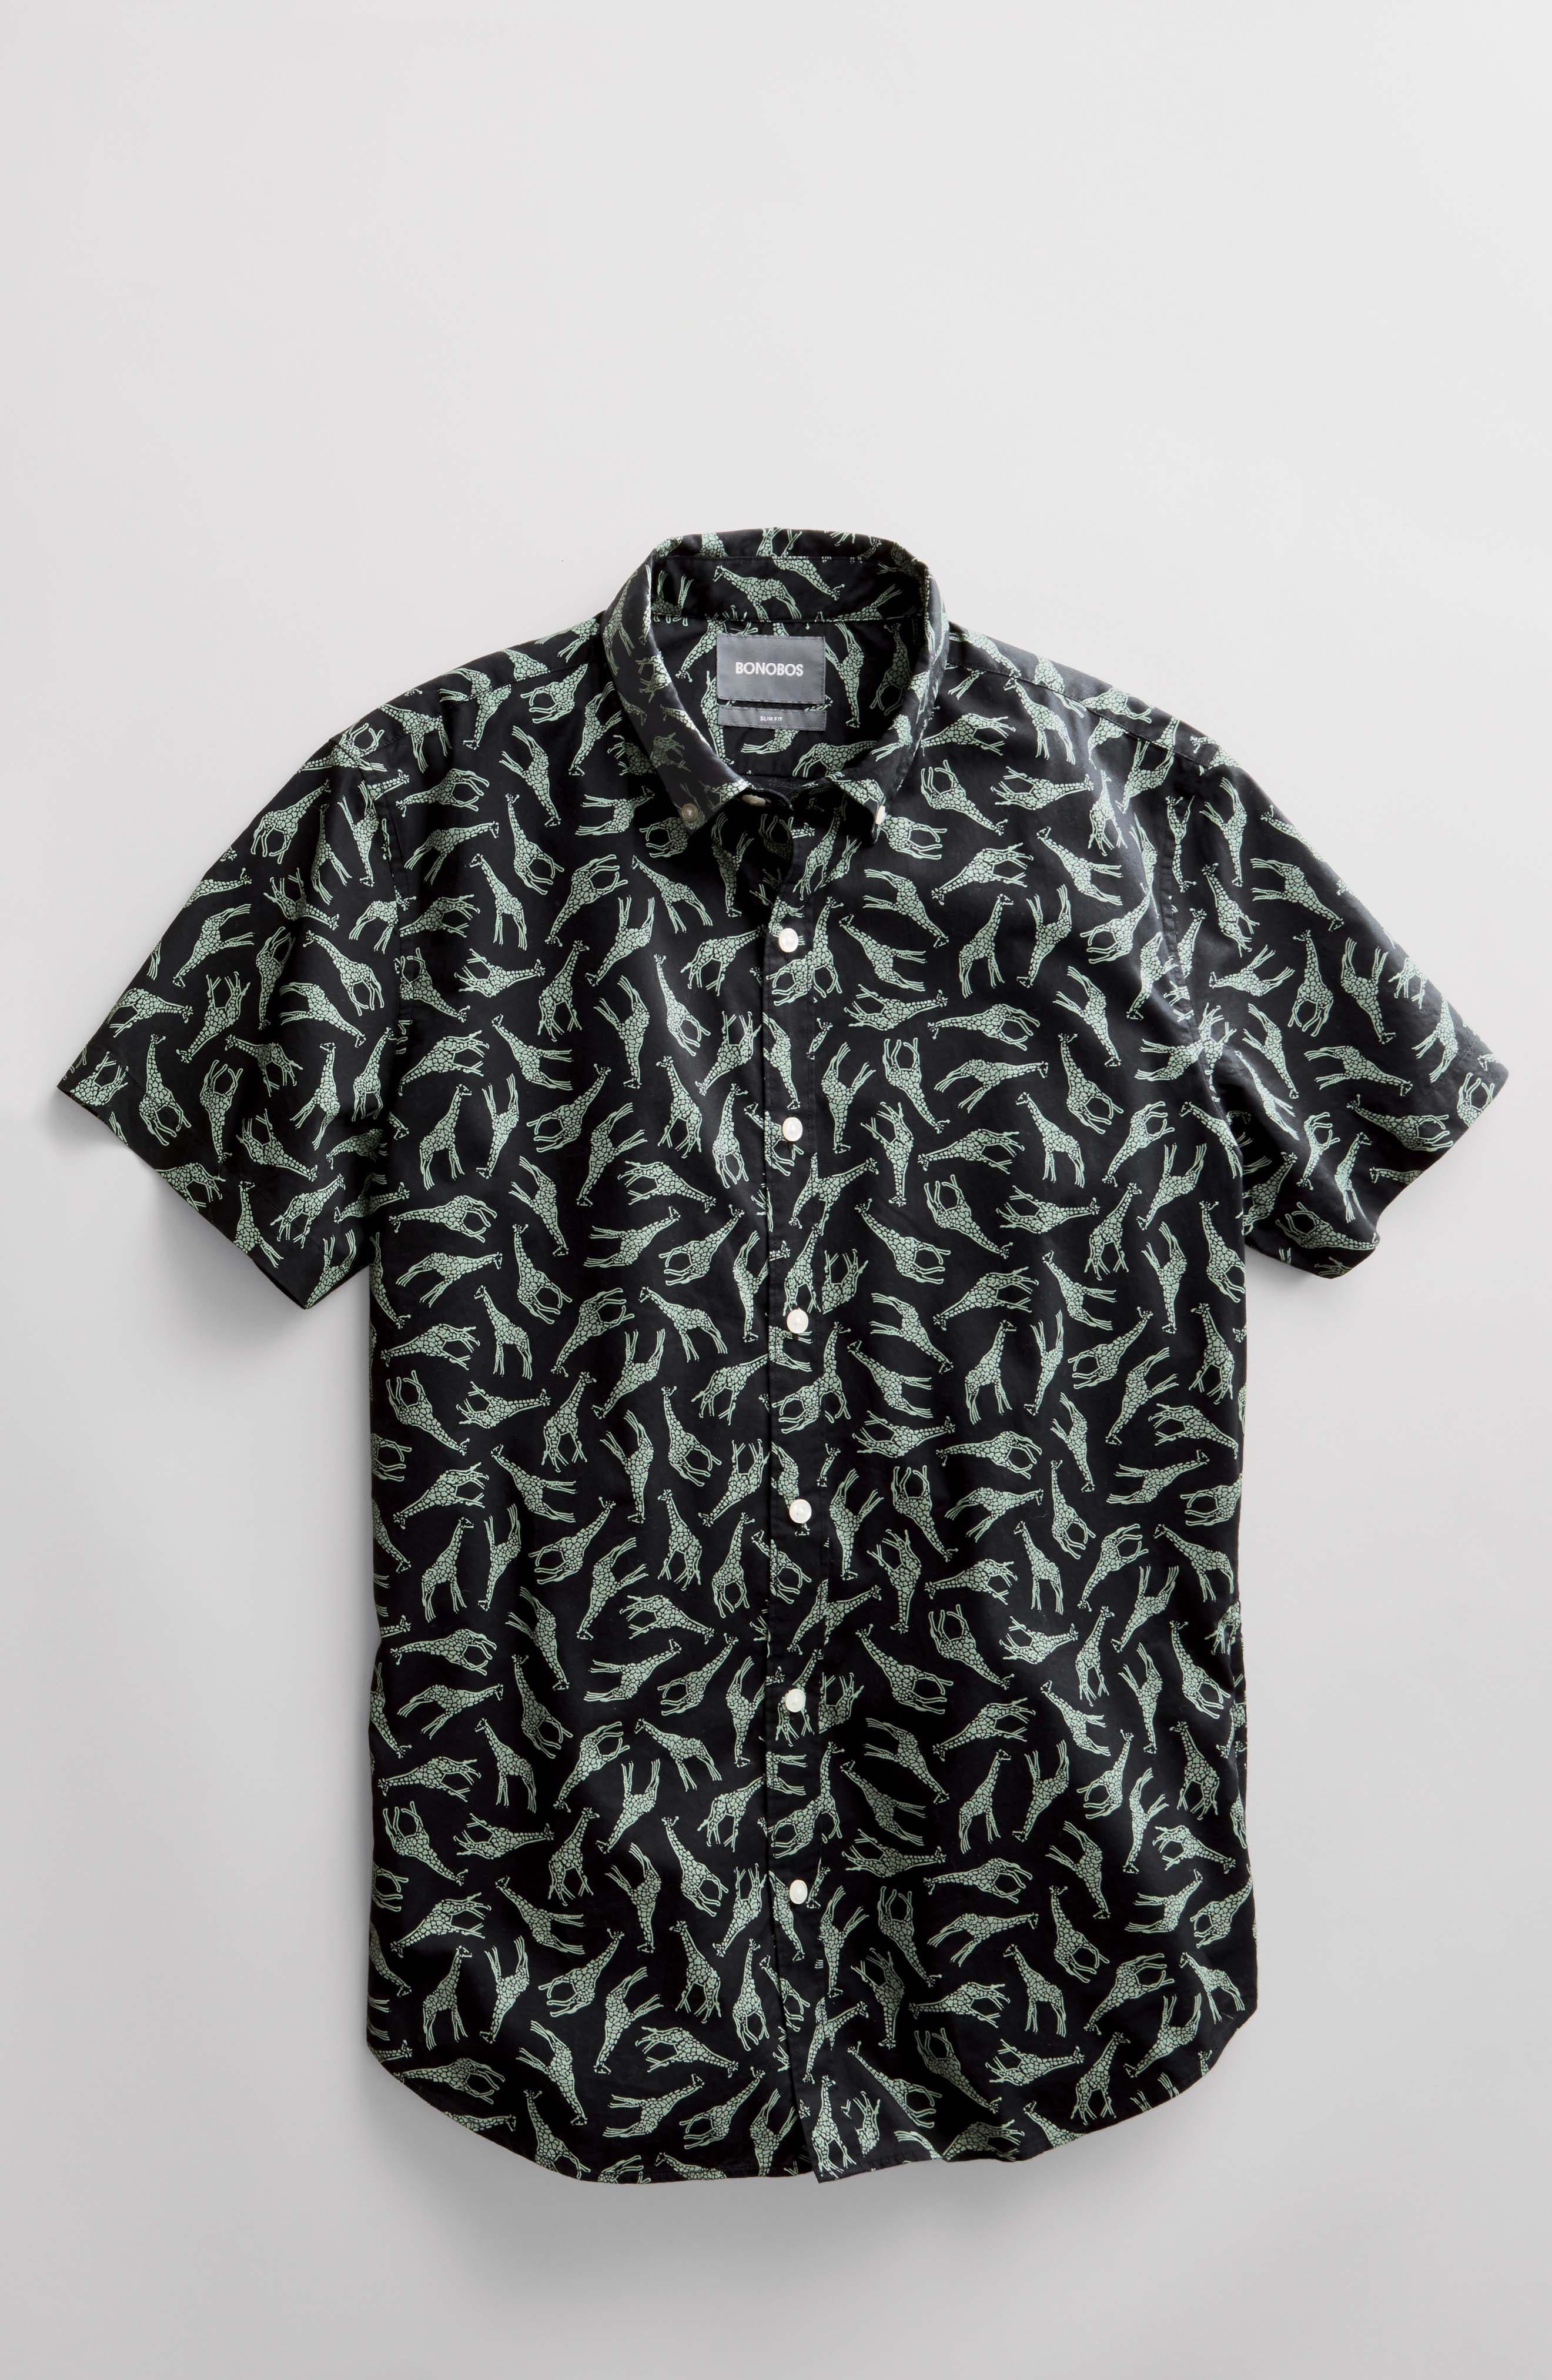 BONOBOS,                             Riviera Slim Fit Giraffe Print Sport Shirt,                             Alternate thumbnail 7, color,                             001